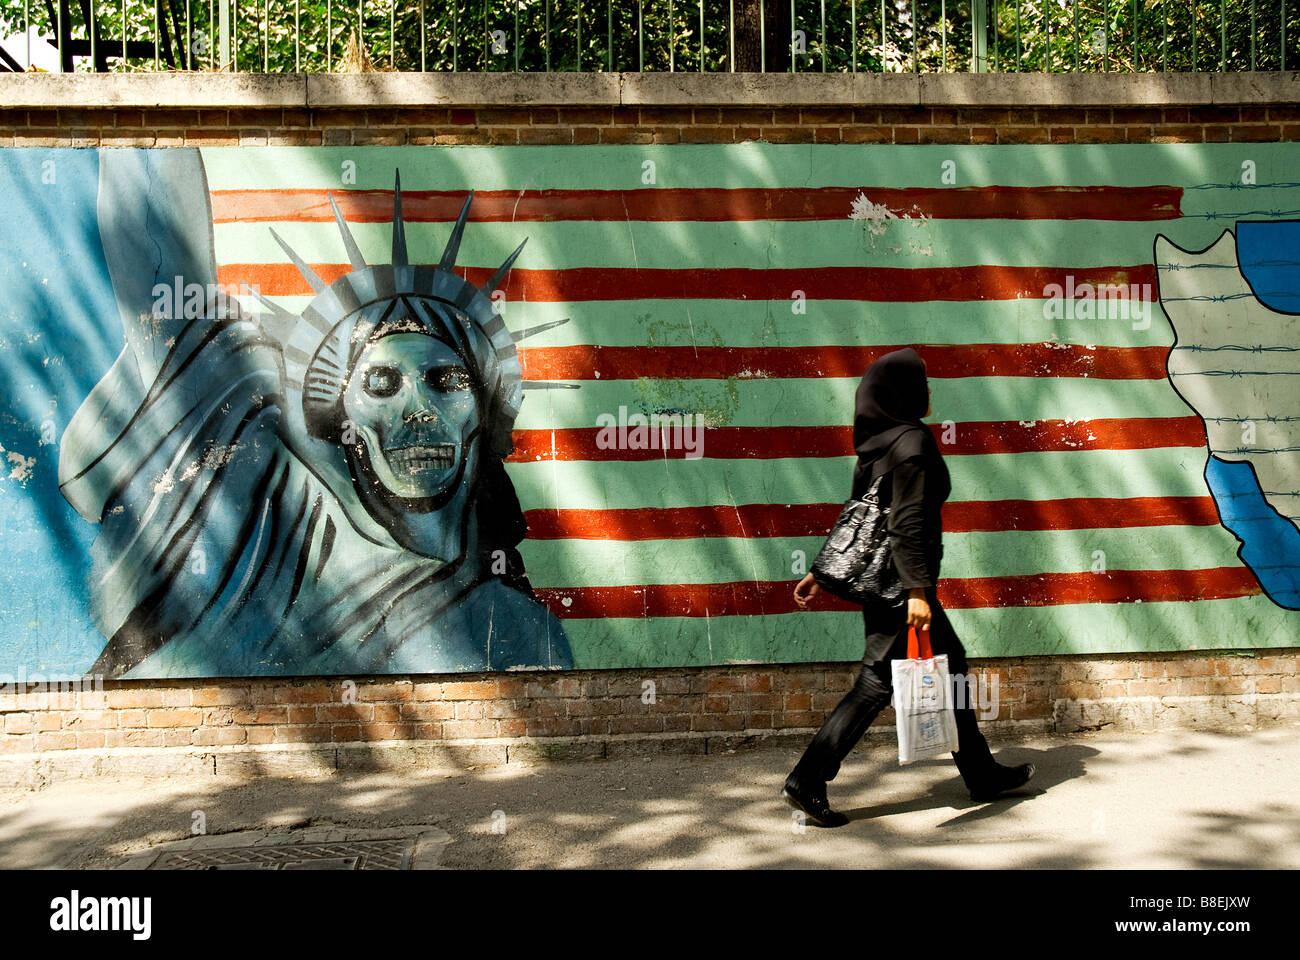 tehran extremist propaganda outside old american embassy teheran iran revolution jihad - Stock Image